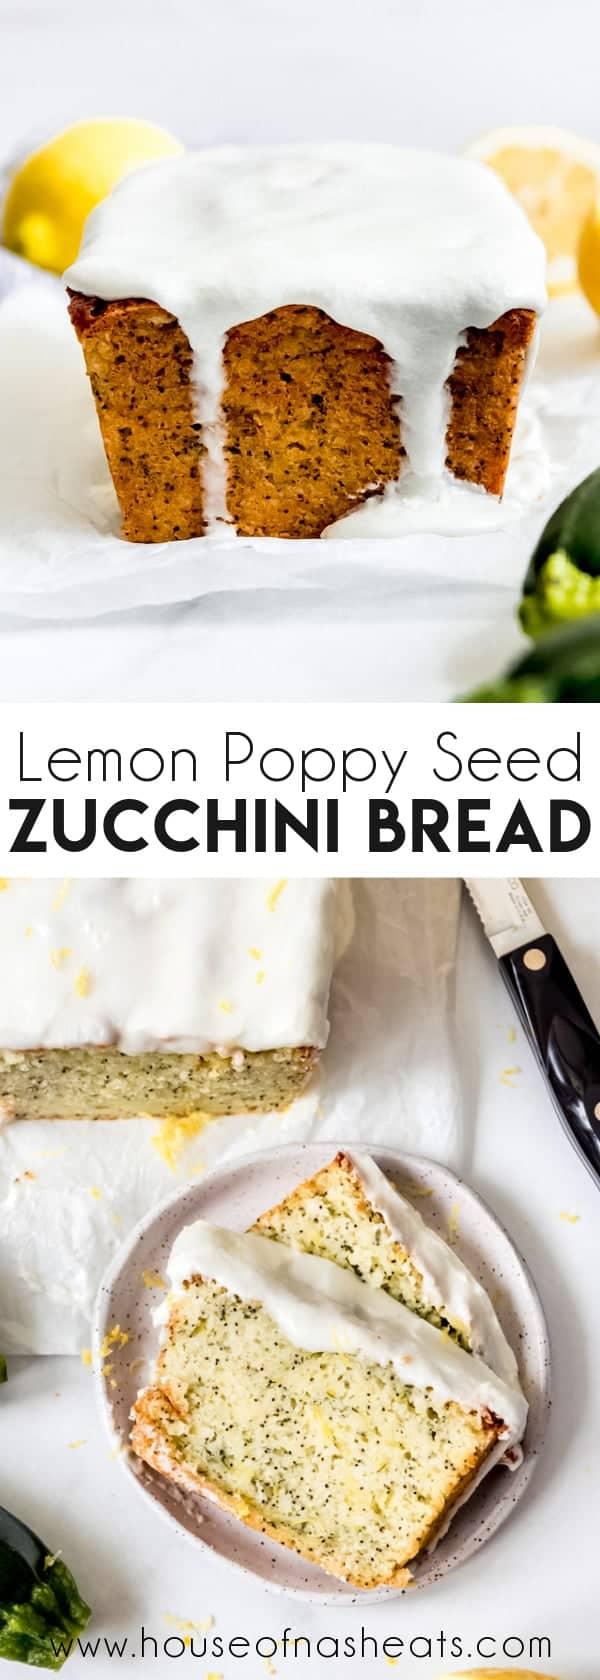 lemon poppy seed zucchini bread  house of nash eats